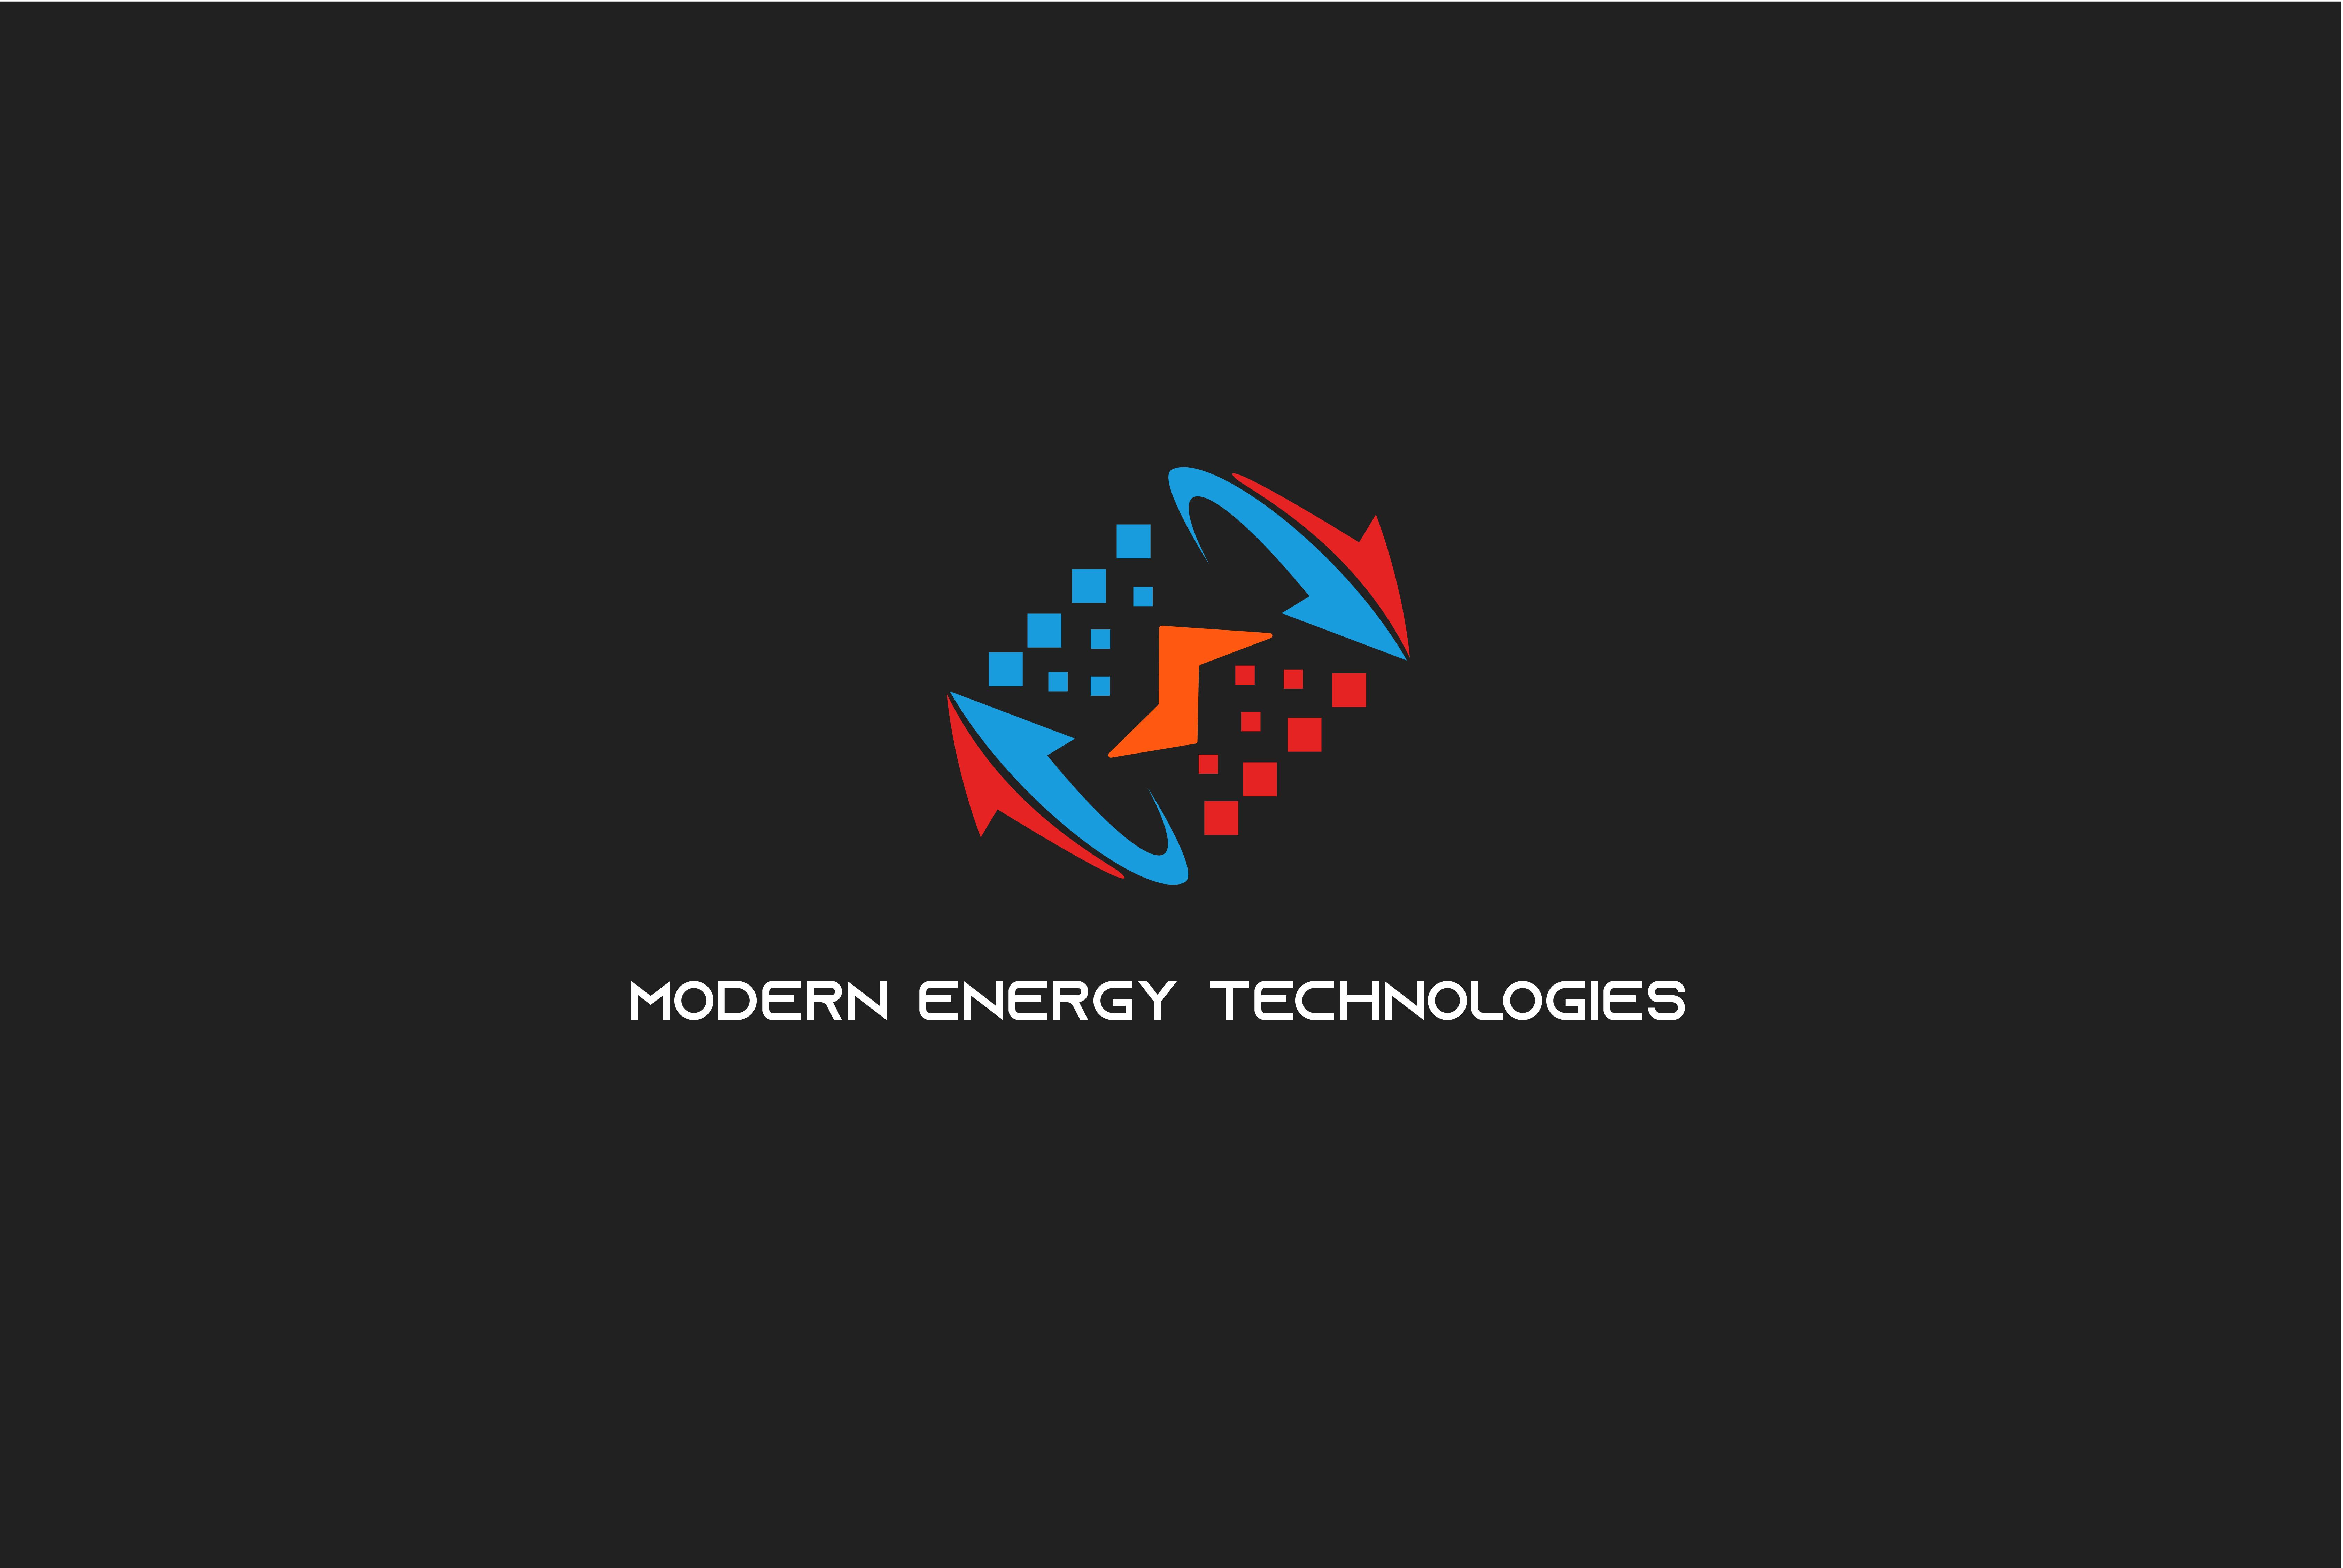 Срочно! Дизайн логотипа ООО «СЭТ» фото f_2995d5182f742957.jpg